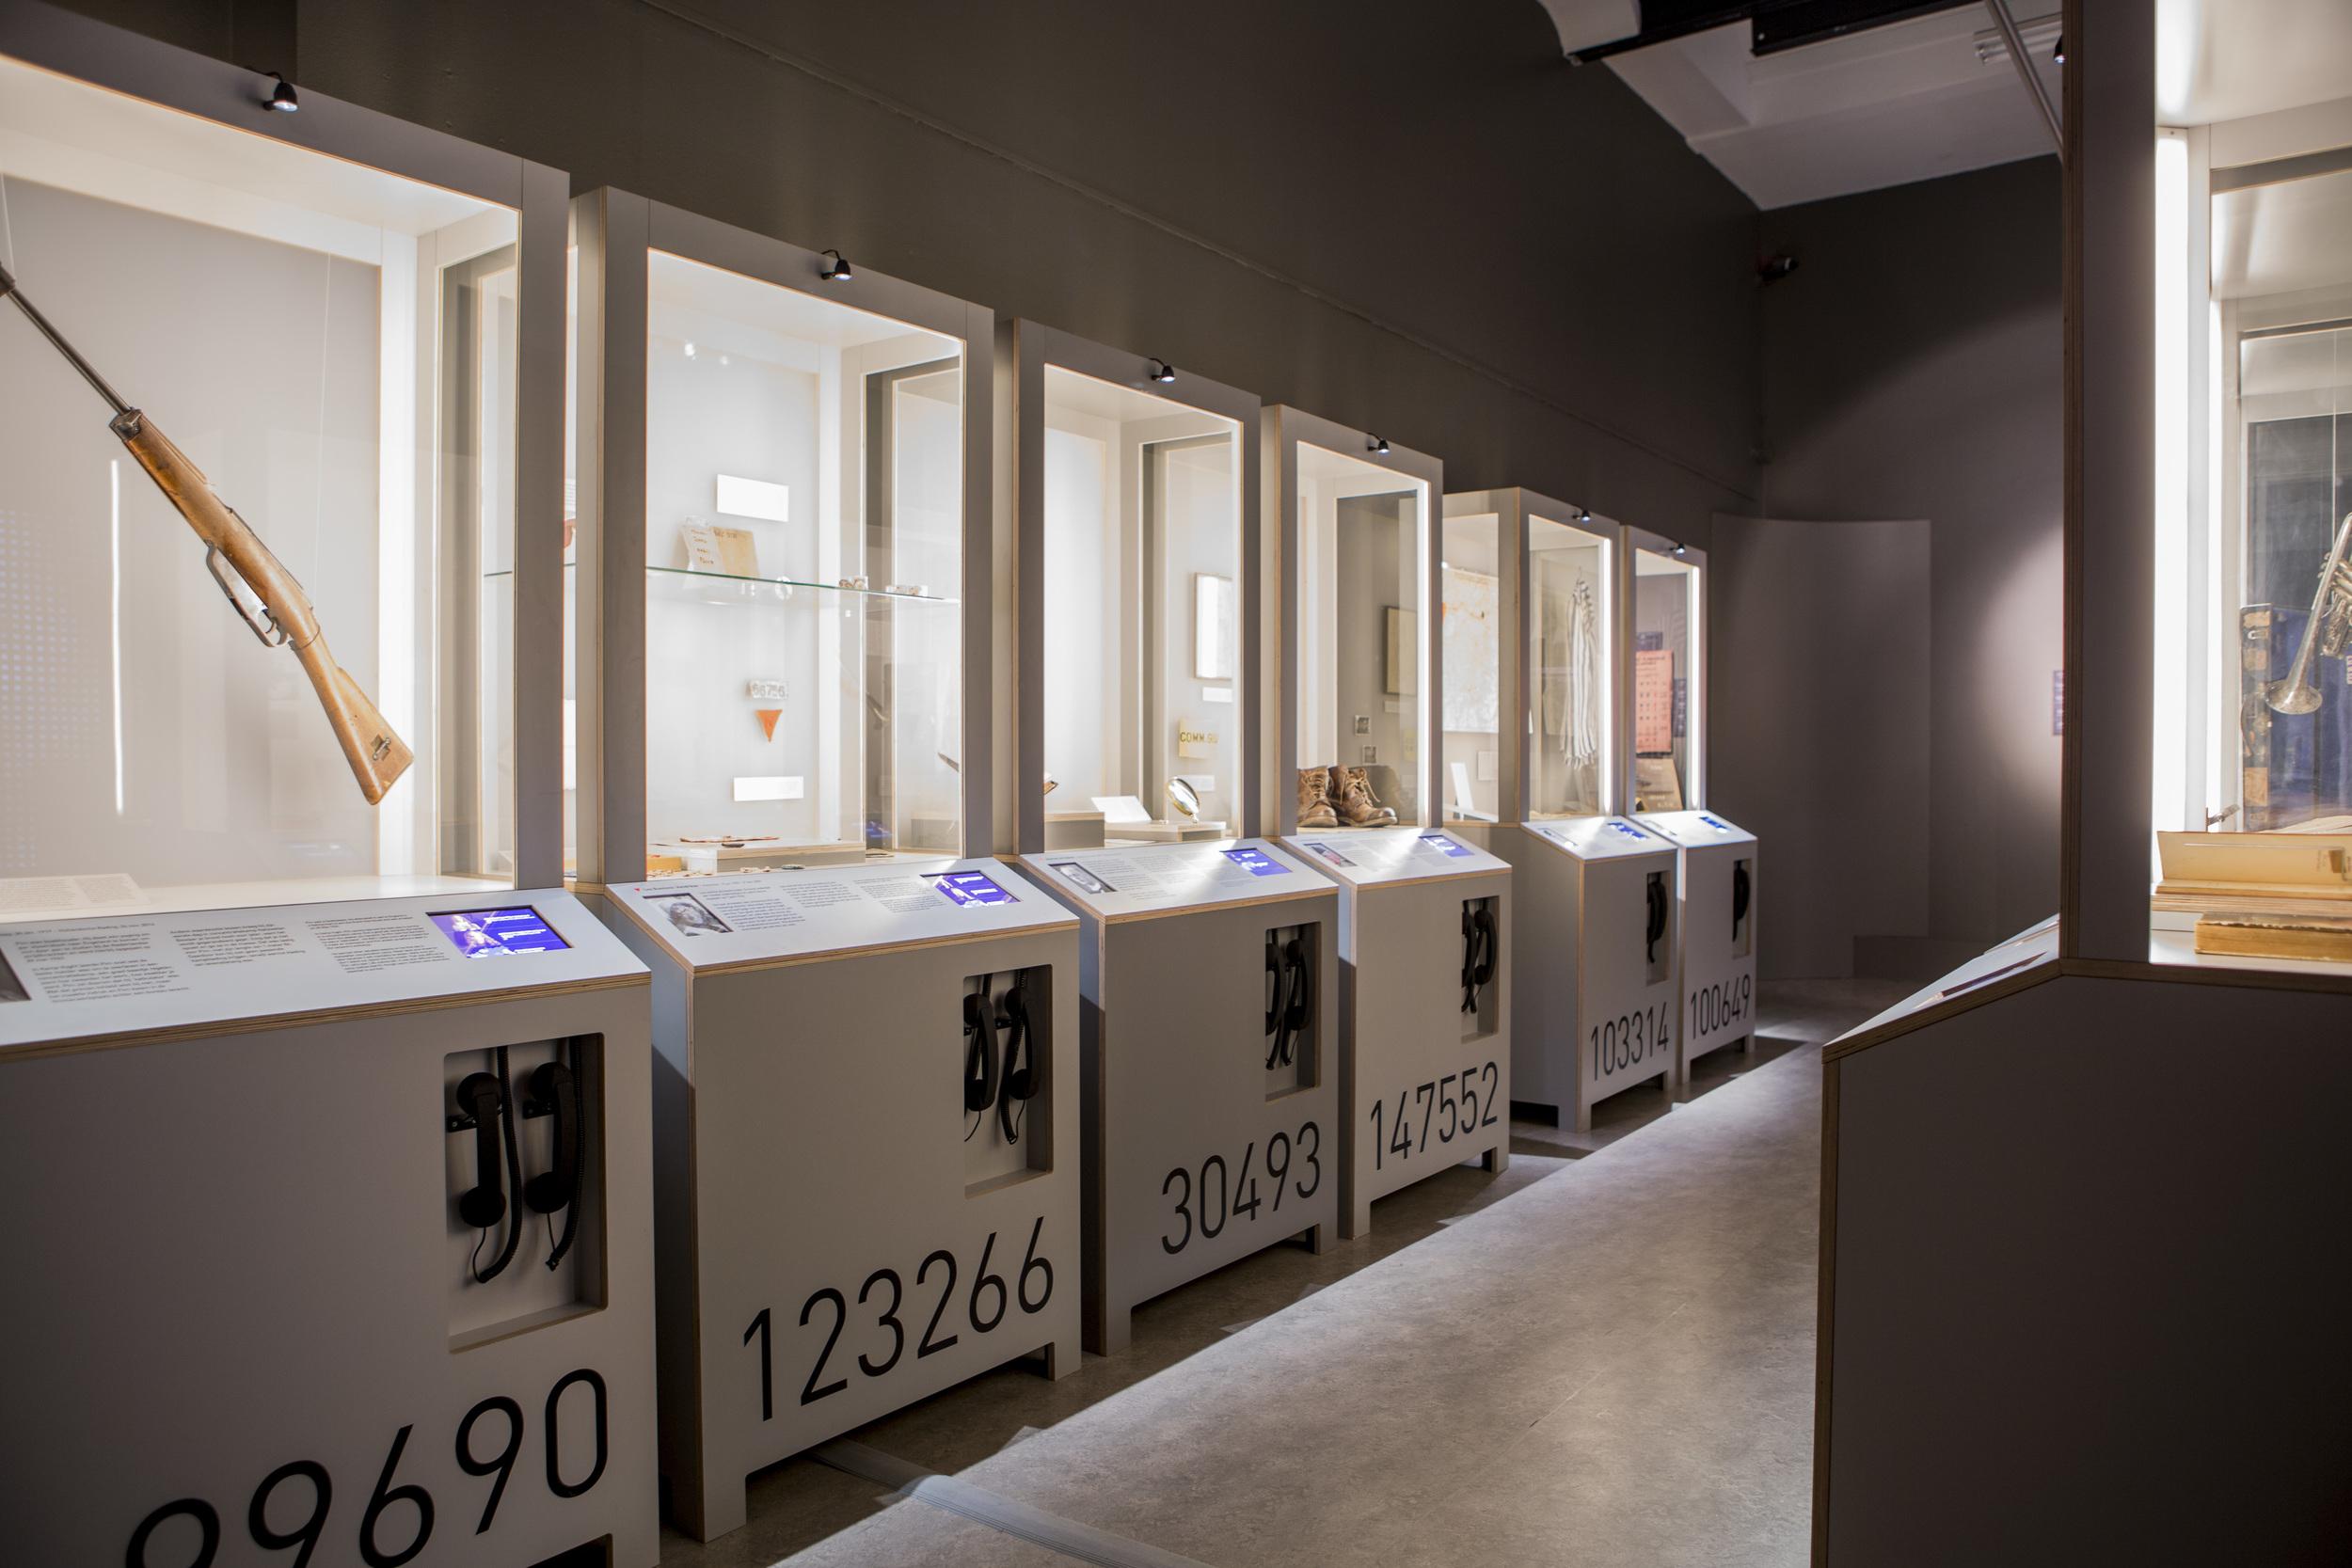 verzetsmuseum007.JPG